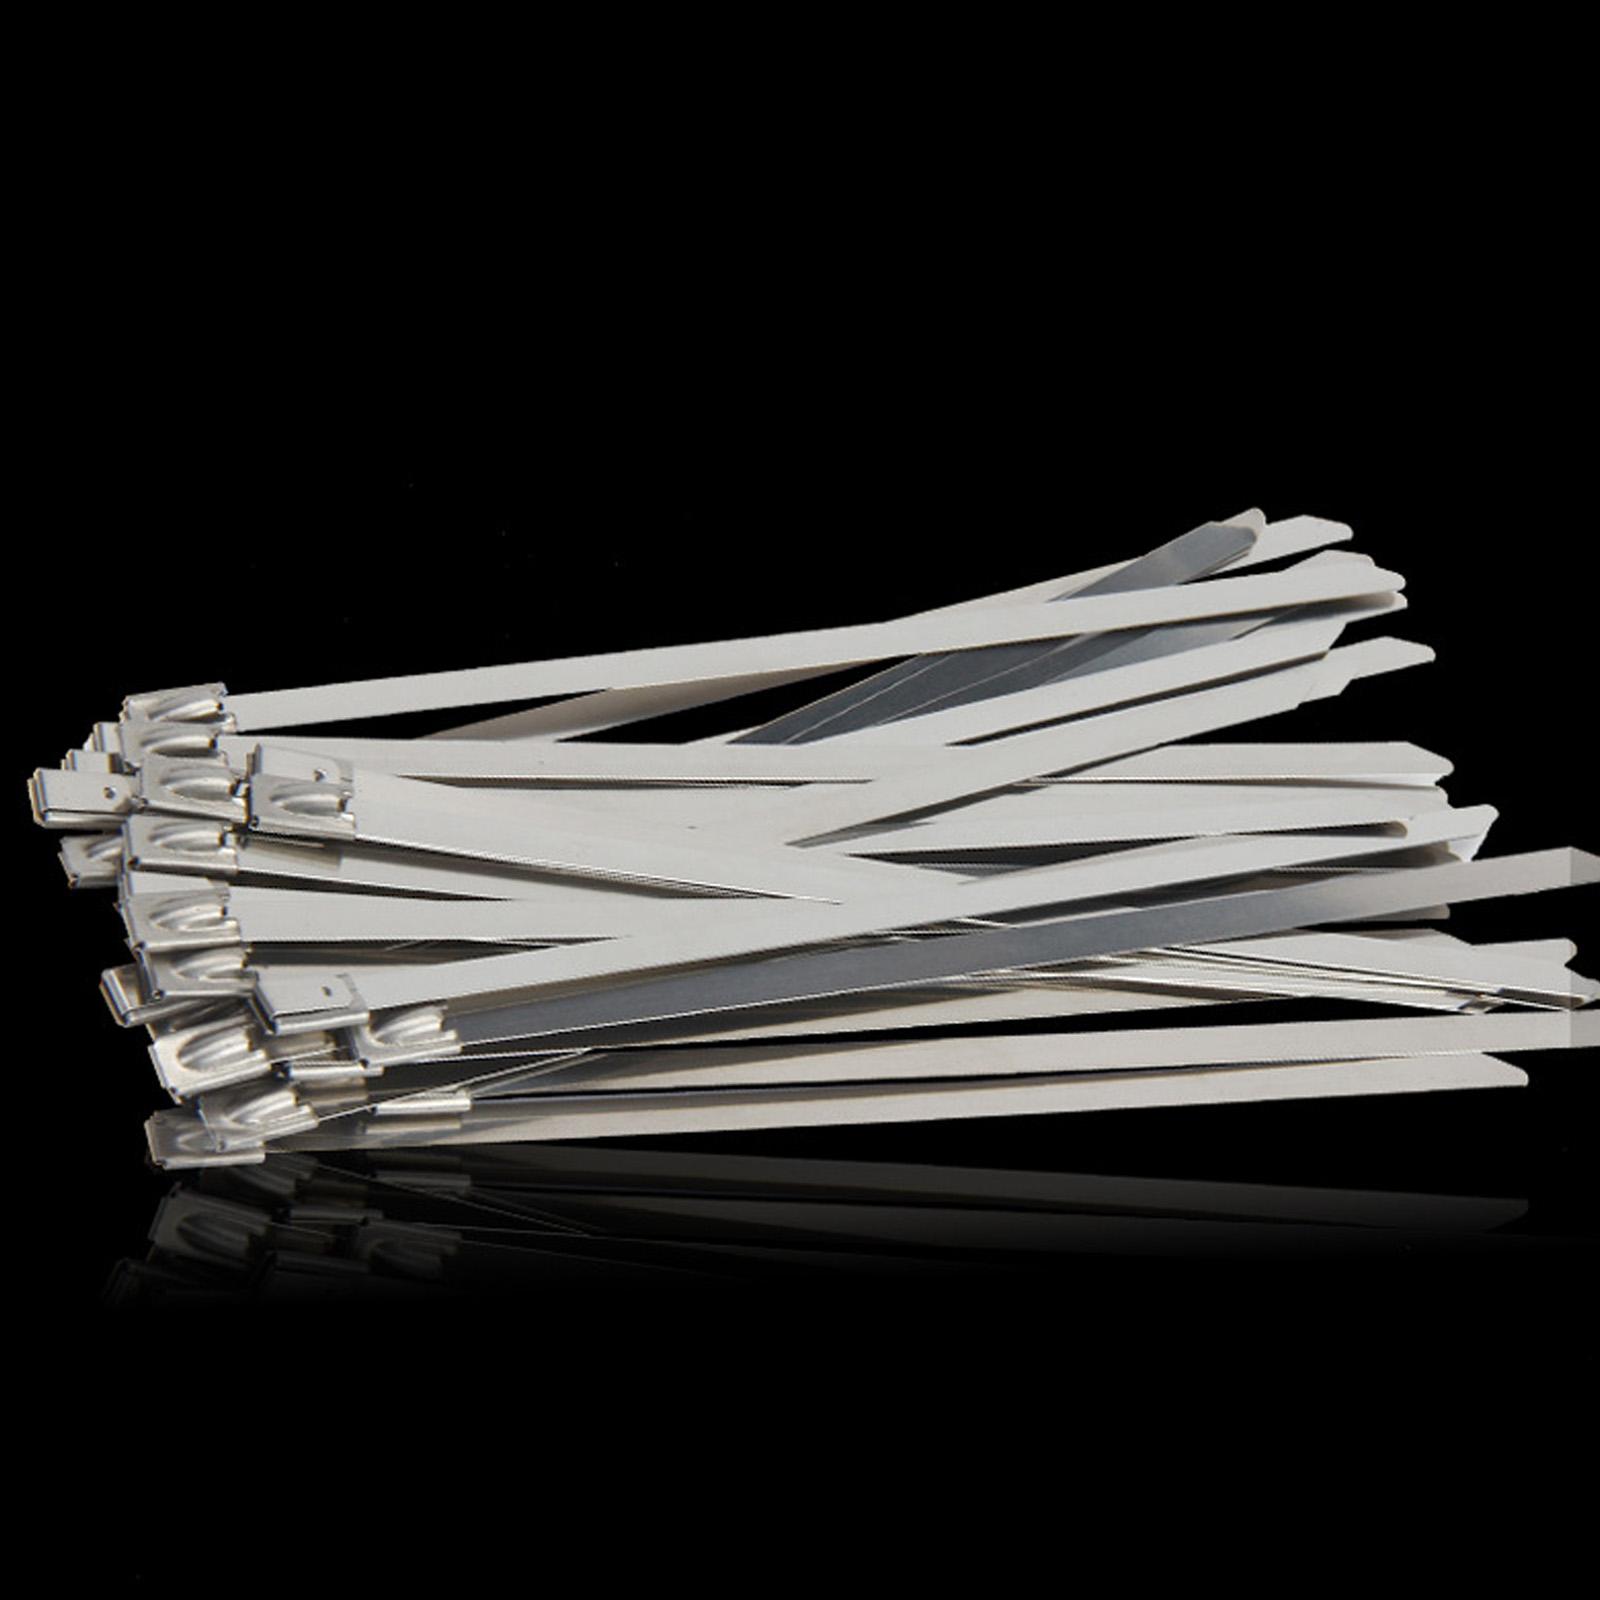 100Pcs Stainless Steel Cable Ties Grade Metal Cable Ties Zip Tie Locking Wire